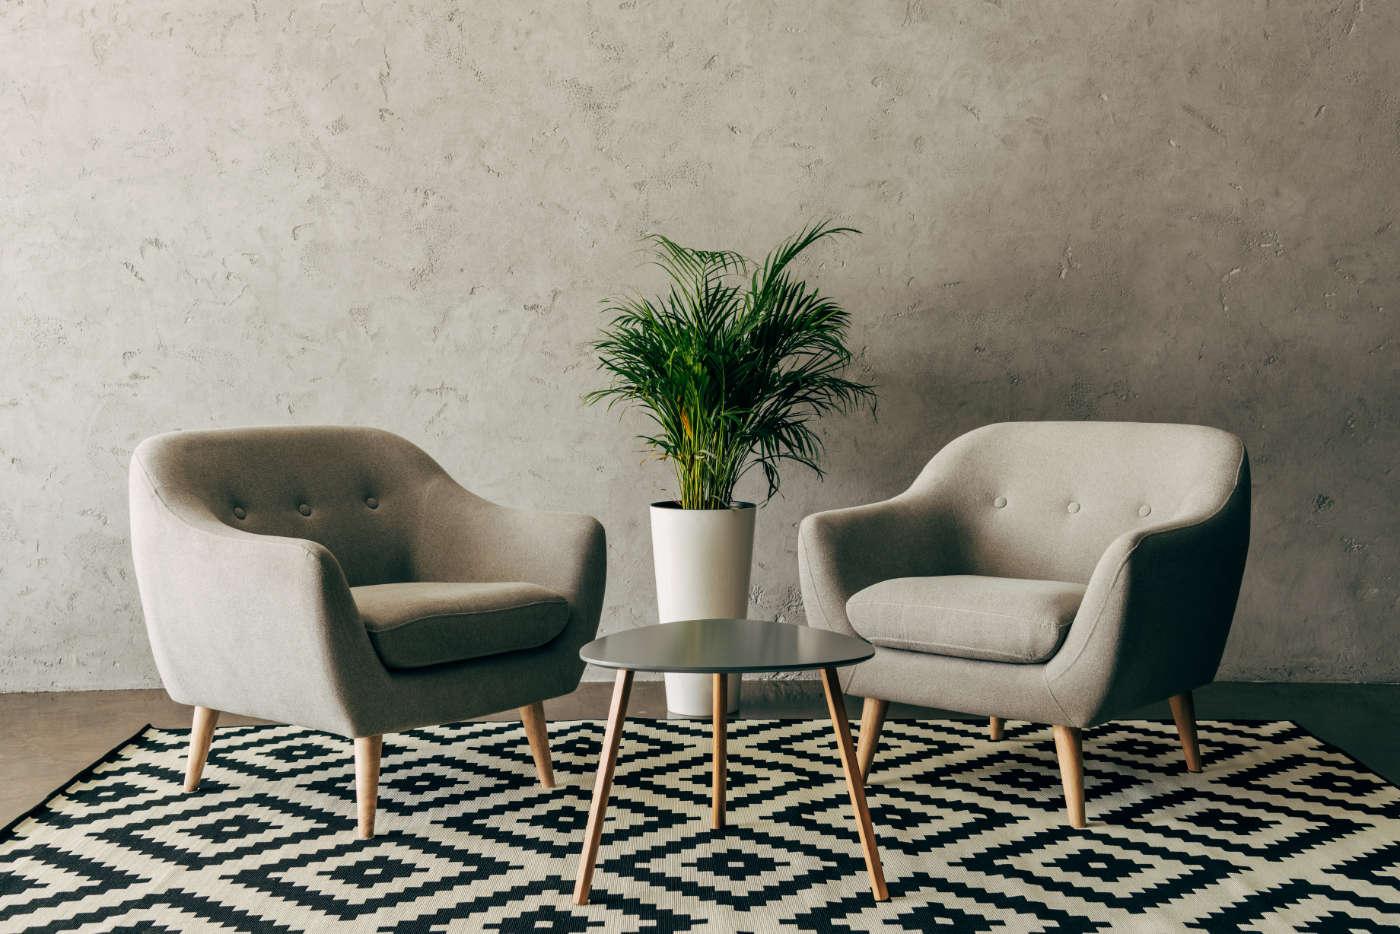 modern-interior-with-vintage-furniture-in-loft-sty-LFVPJST.jpg